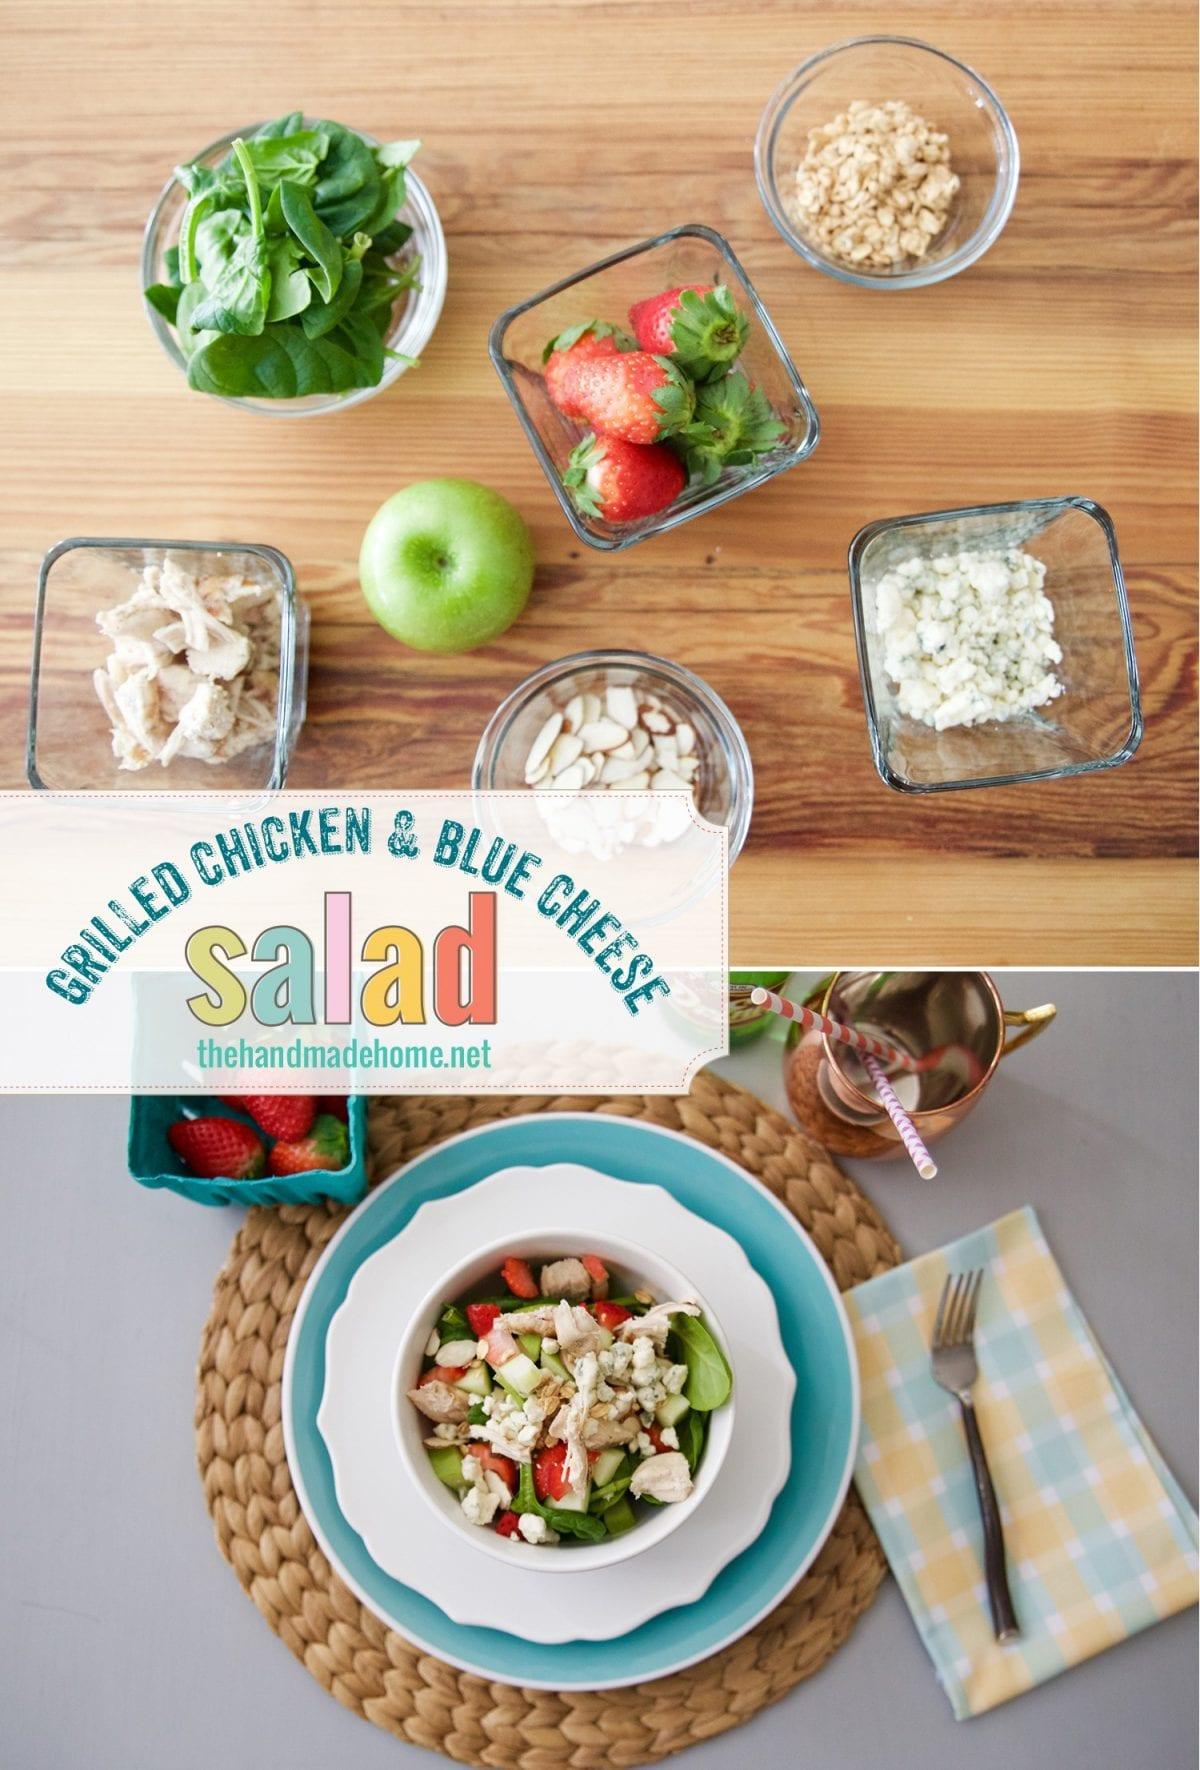 grilled_chicken_blue_cheese_salad_recipe